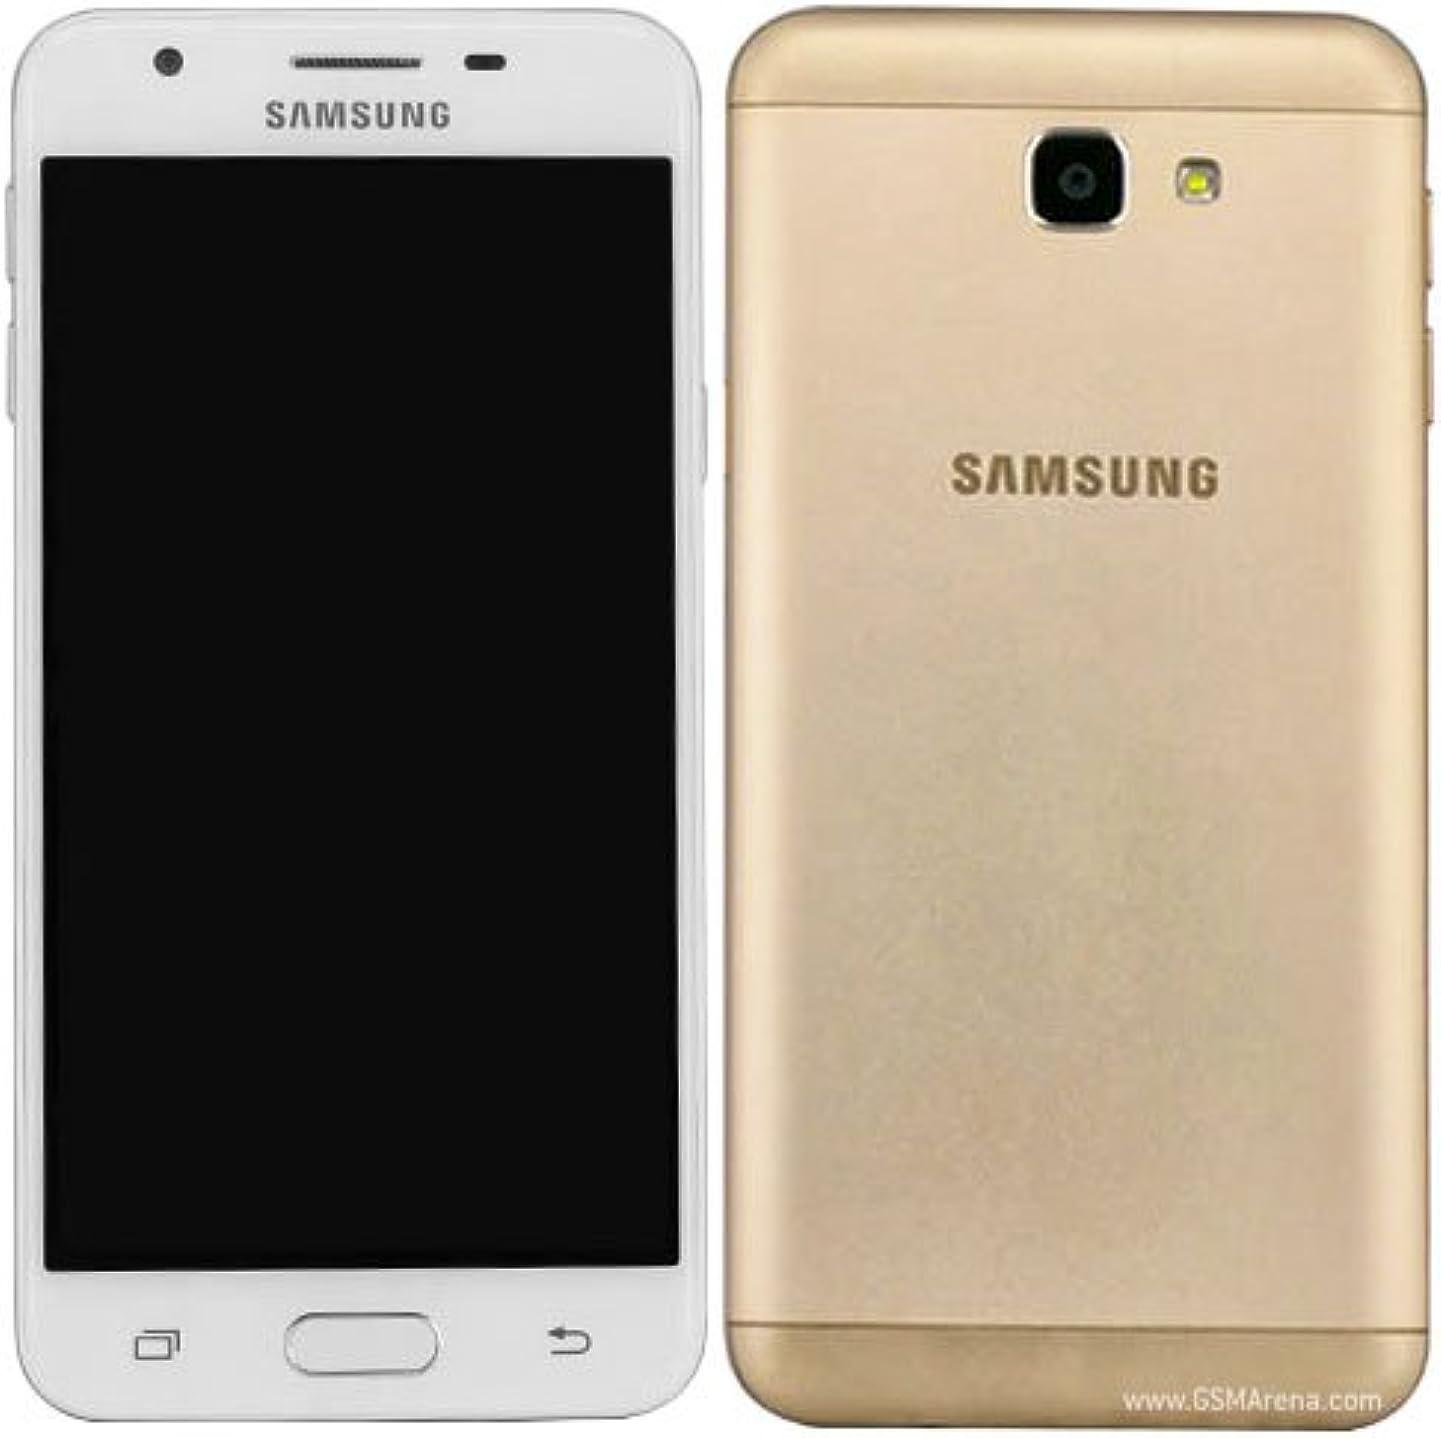 SAMSUNG GALAXY On5 2016 G5528 16GB DUAL SIM 4G+ LTE Plus Dual Sim, Unlocked